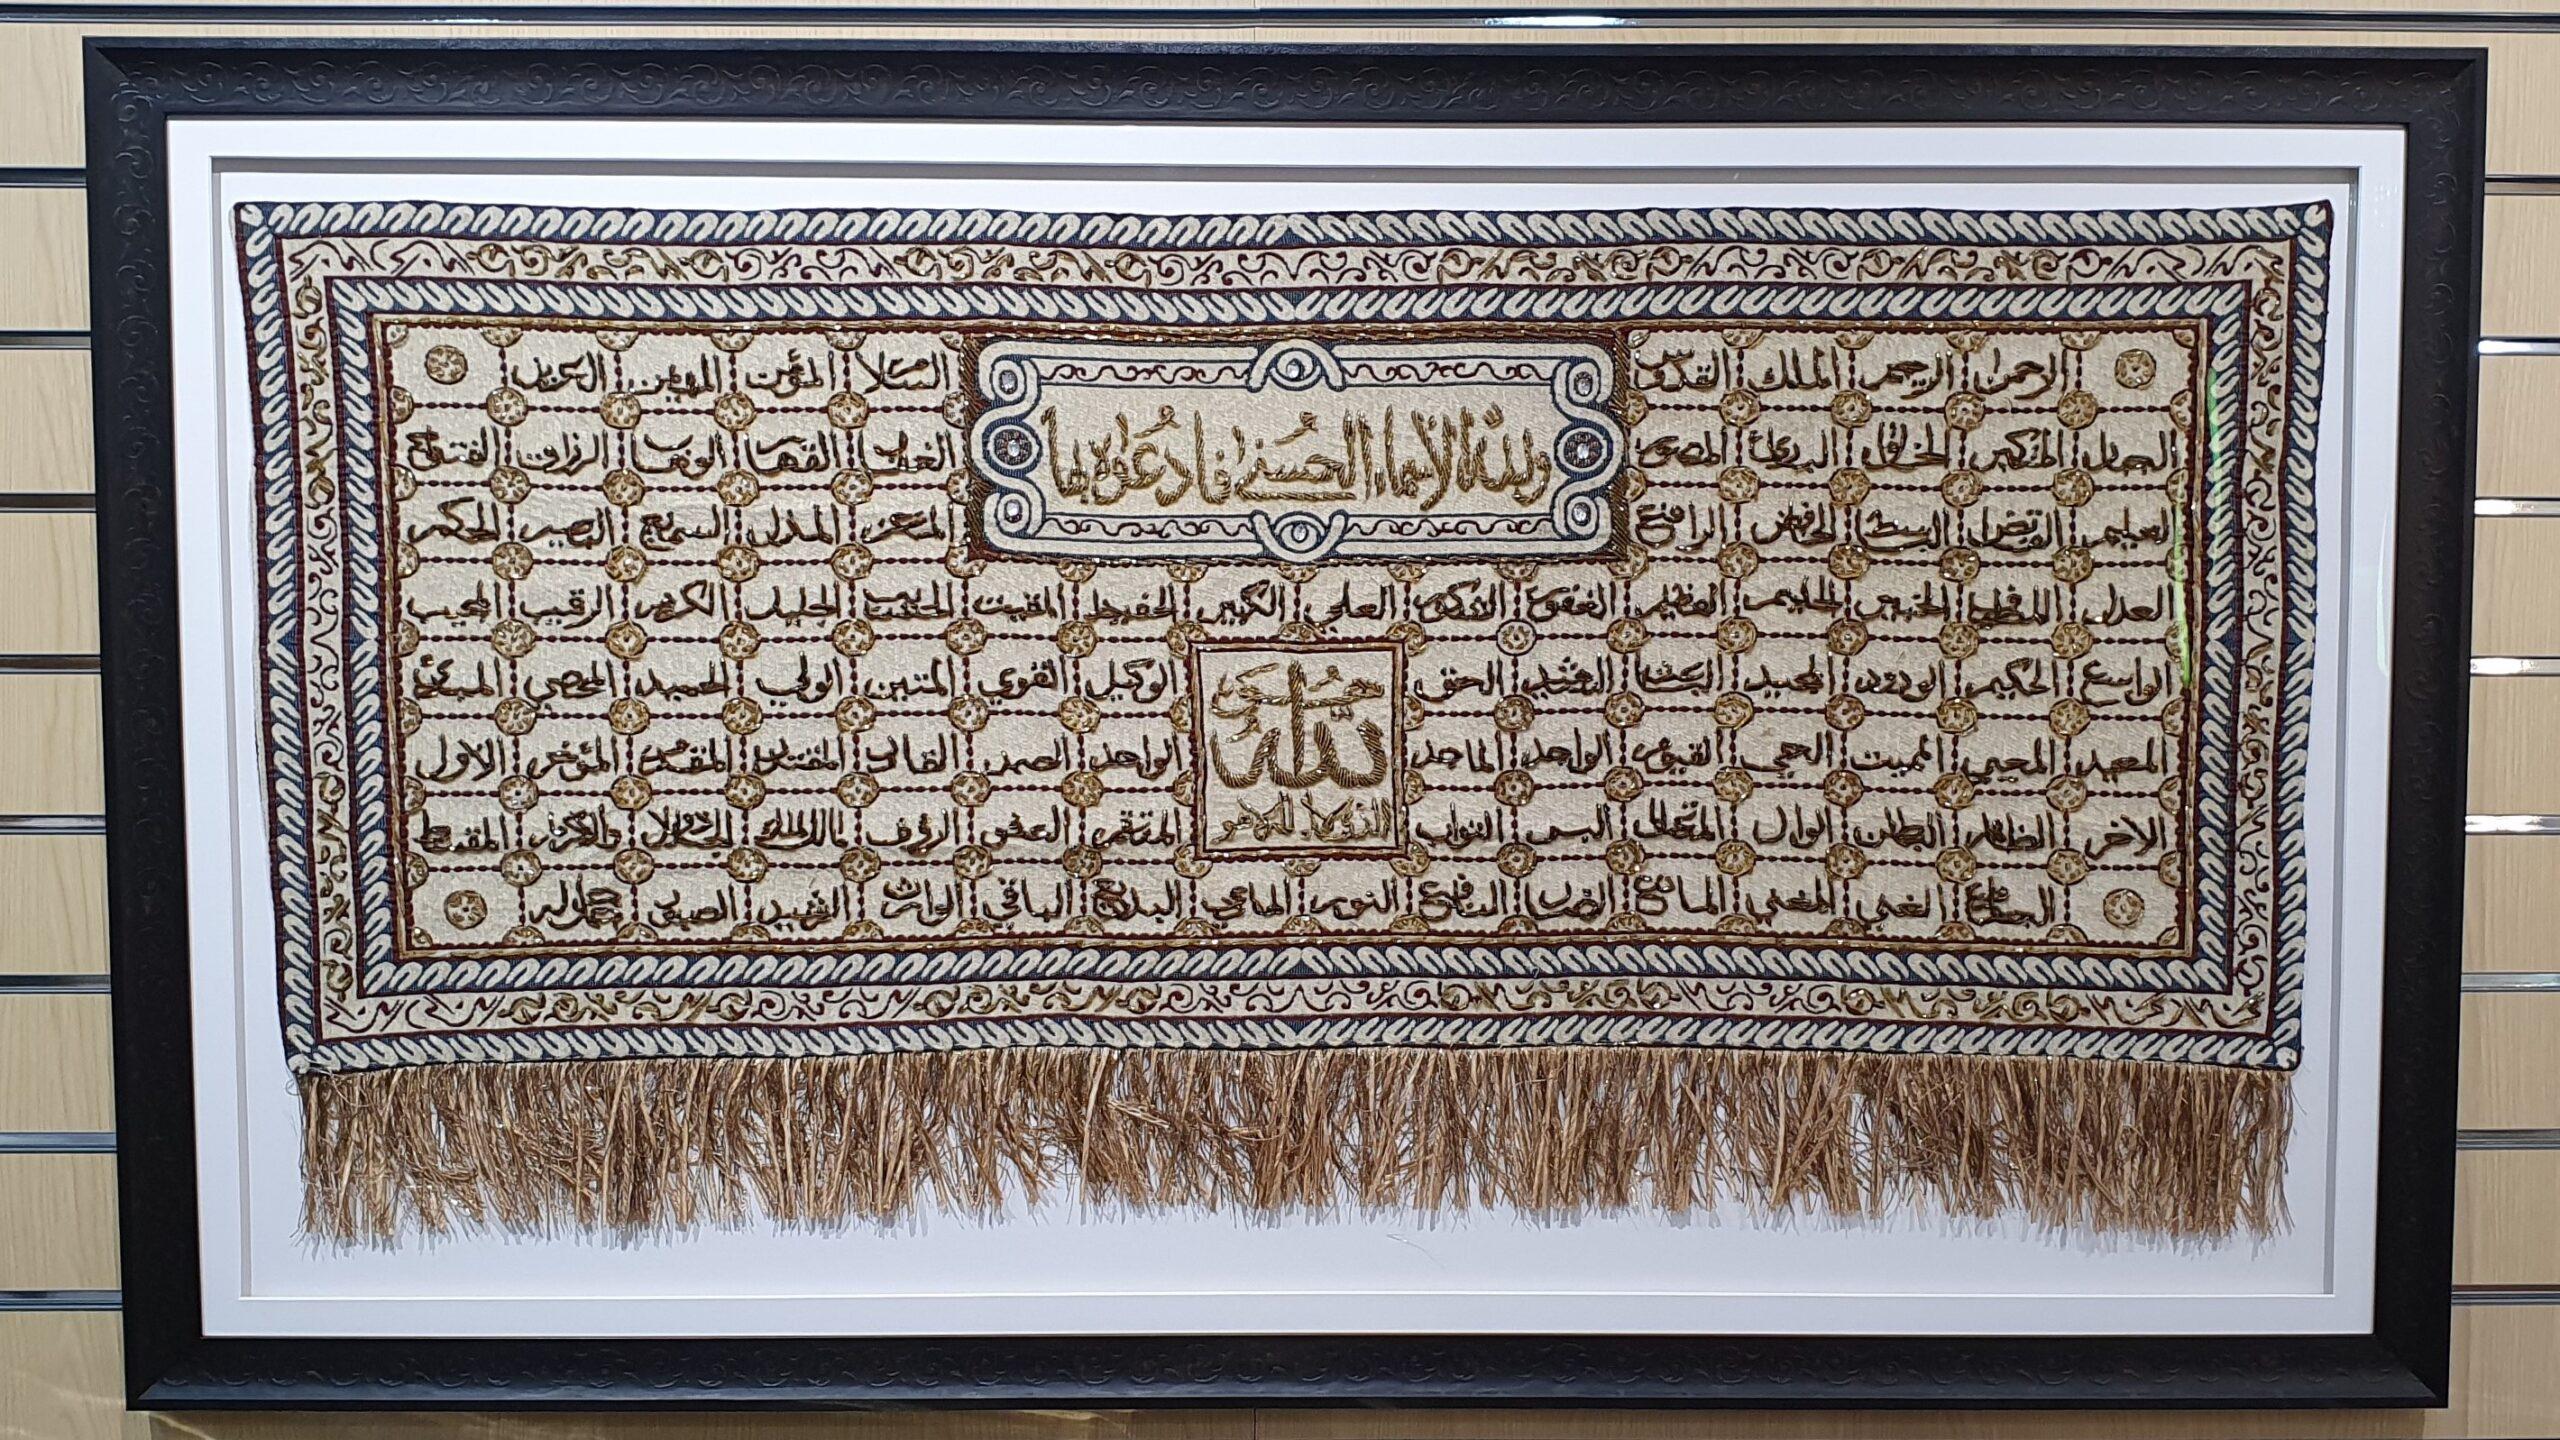 Cross-stitch 99 names of Allah 1